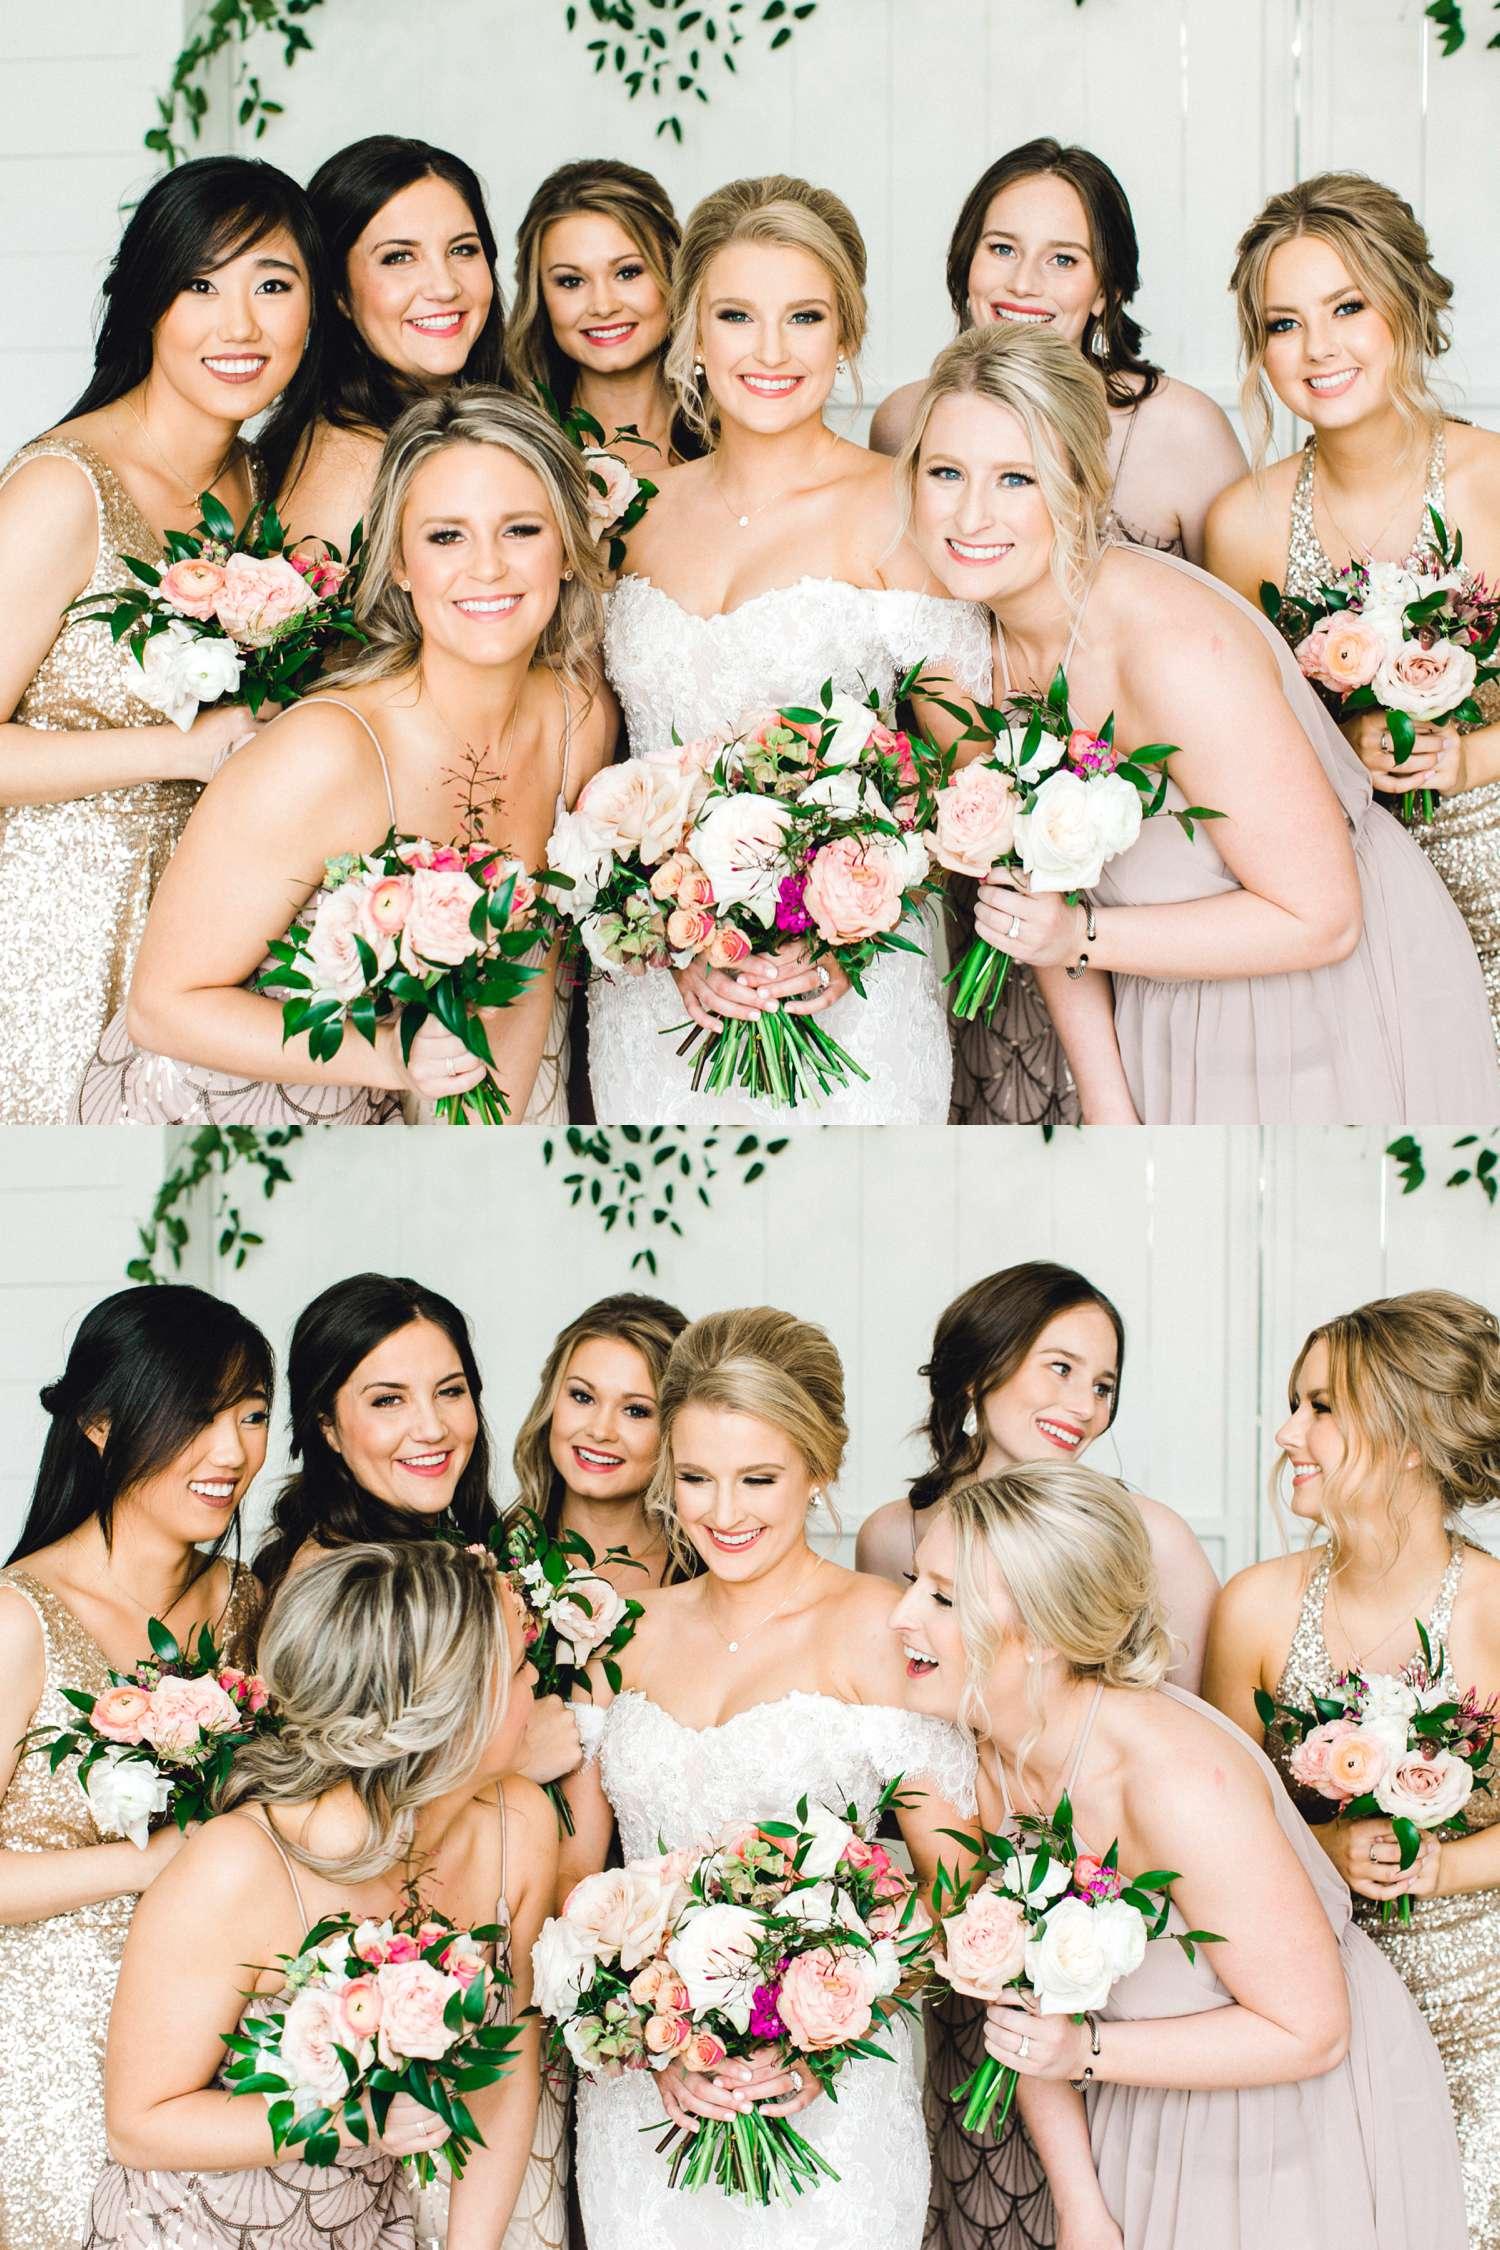 HEBERT_MORGAN_AND_CLAY_ALLEEJ_THE_FARMHOUSE_MONTGOMERY_TEXAS_WEDDING_0030.jpg